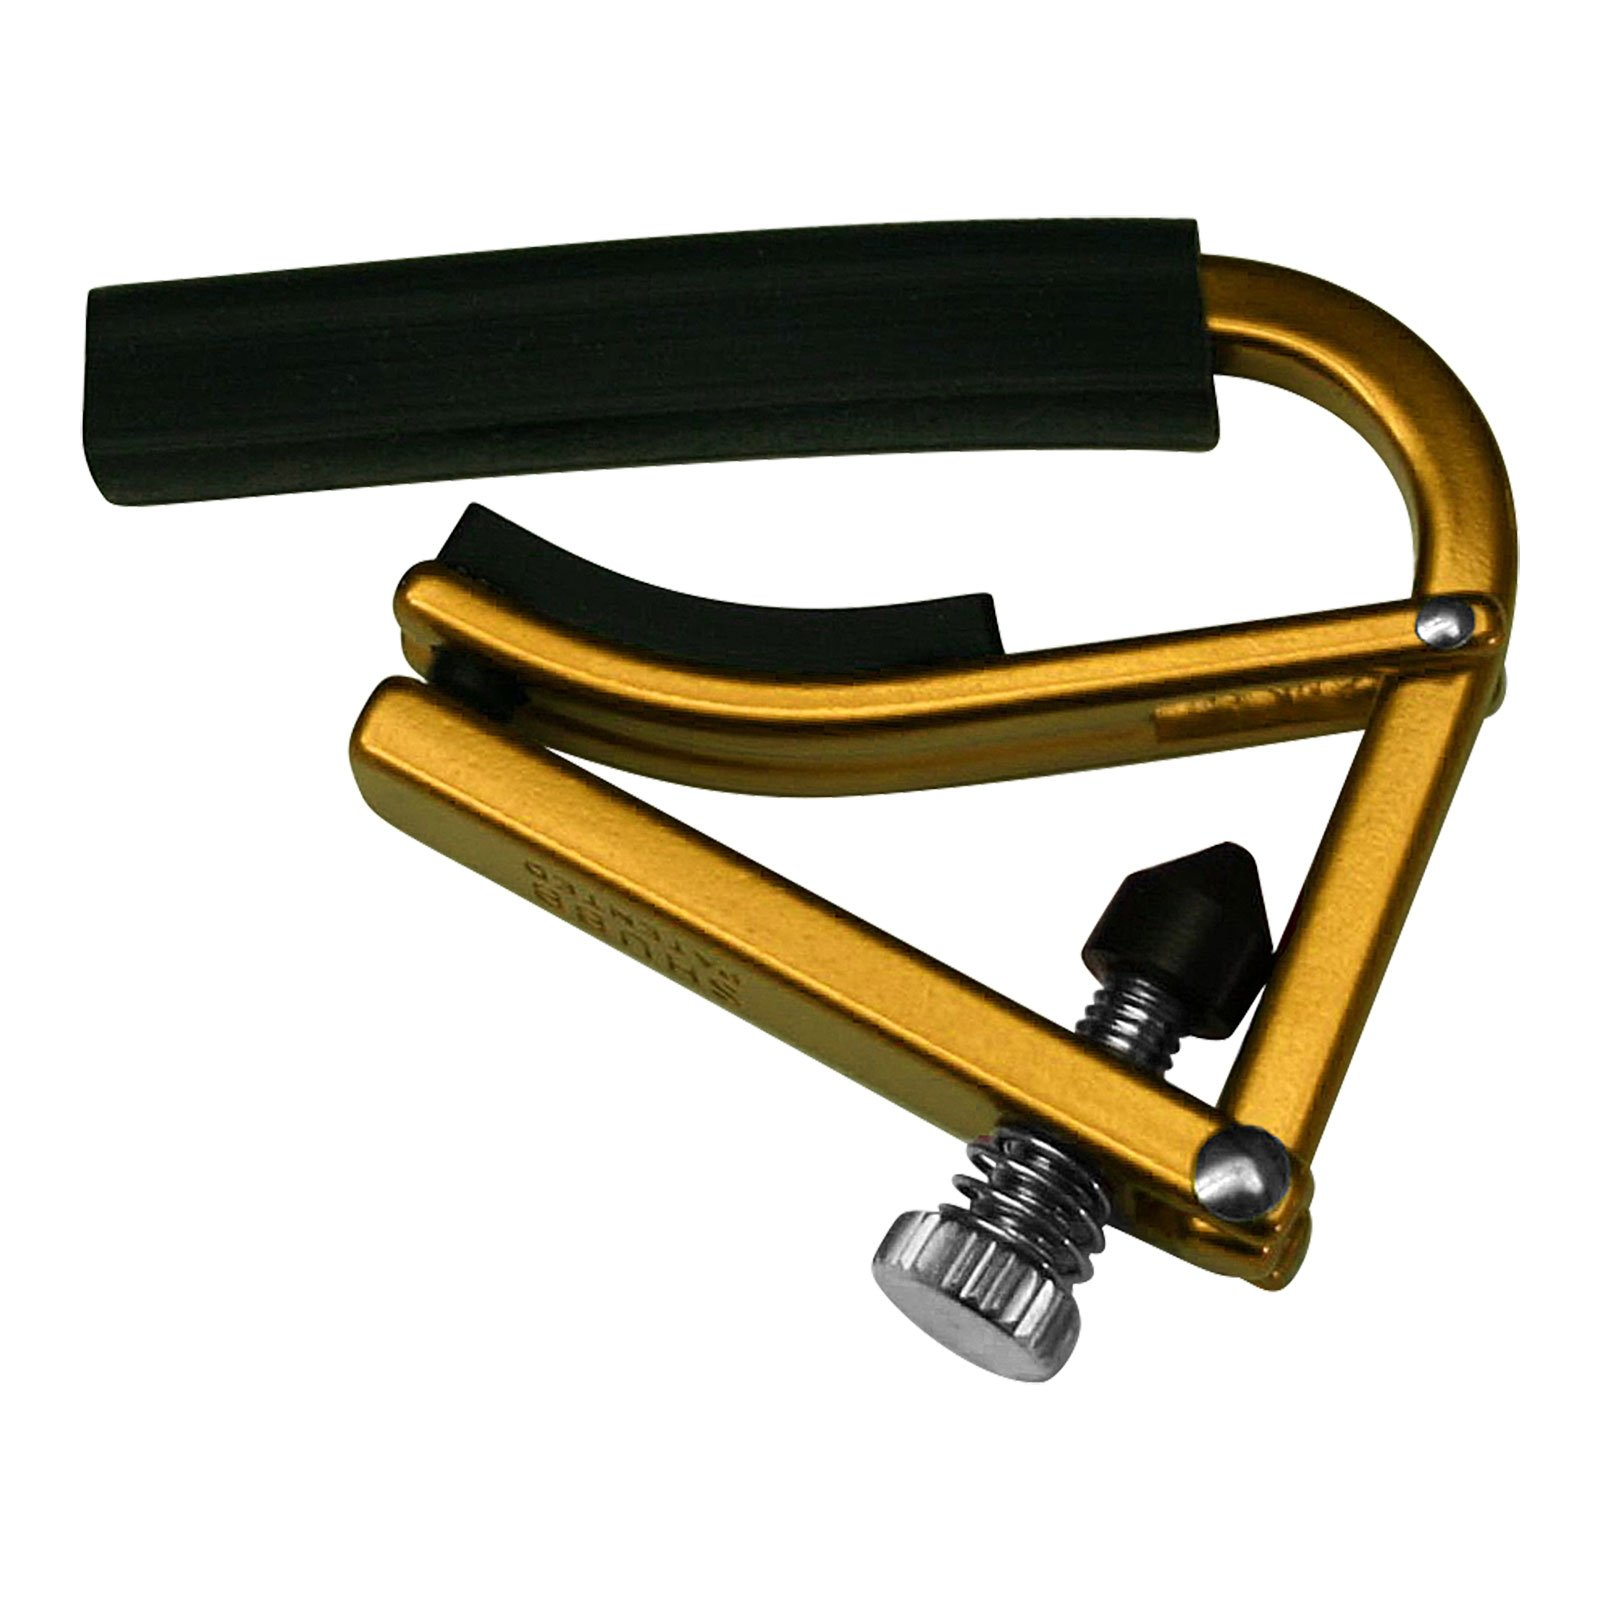 Shubb Lite Series GC-20ALGD (L1GLD) Acoustic Guitar Capo - Anodized Gold